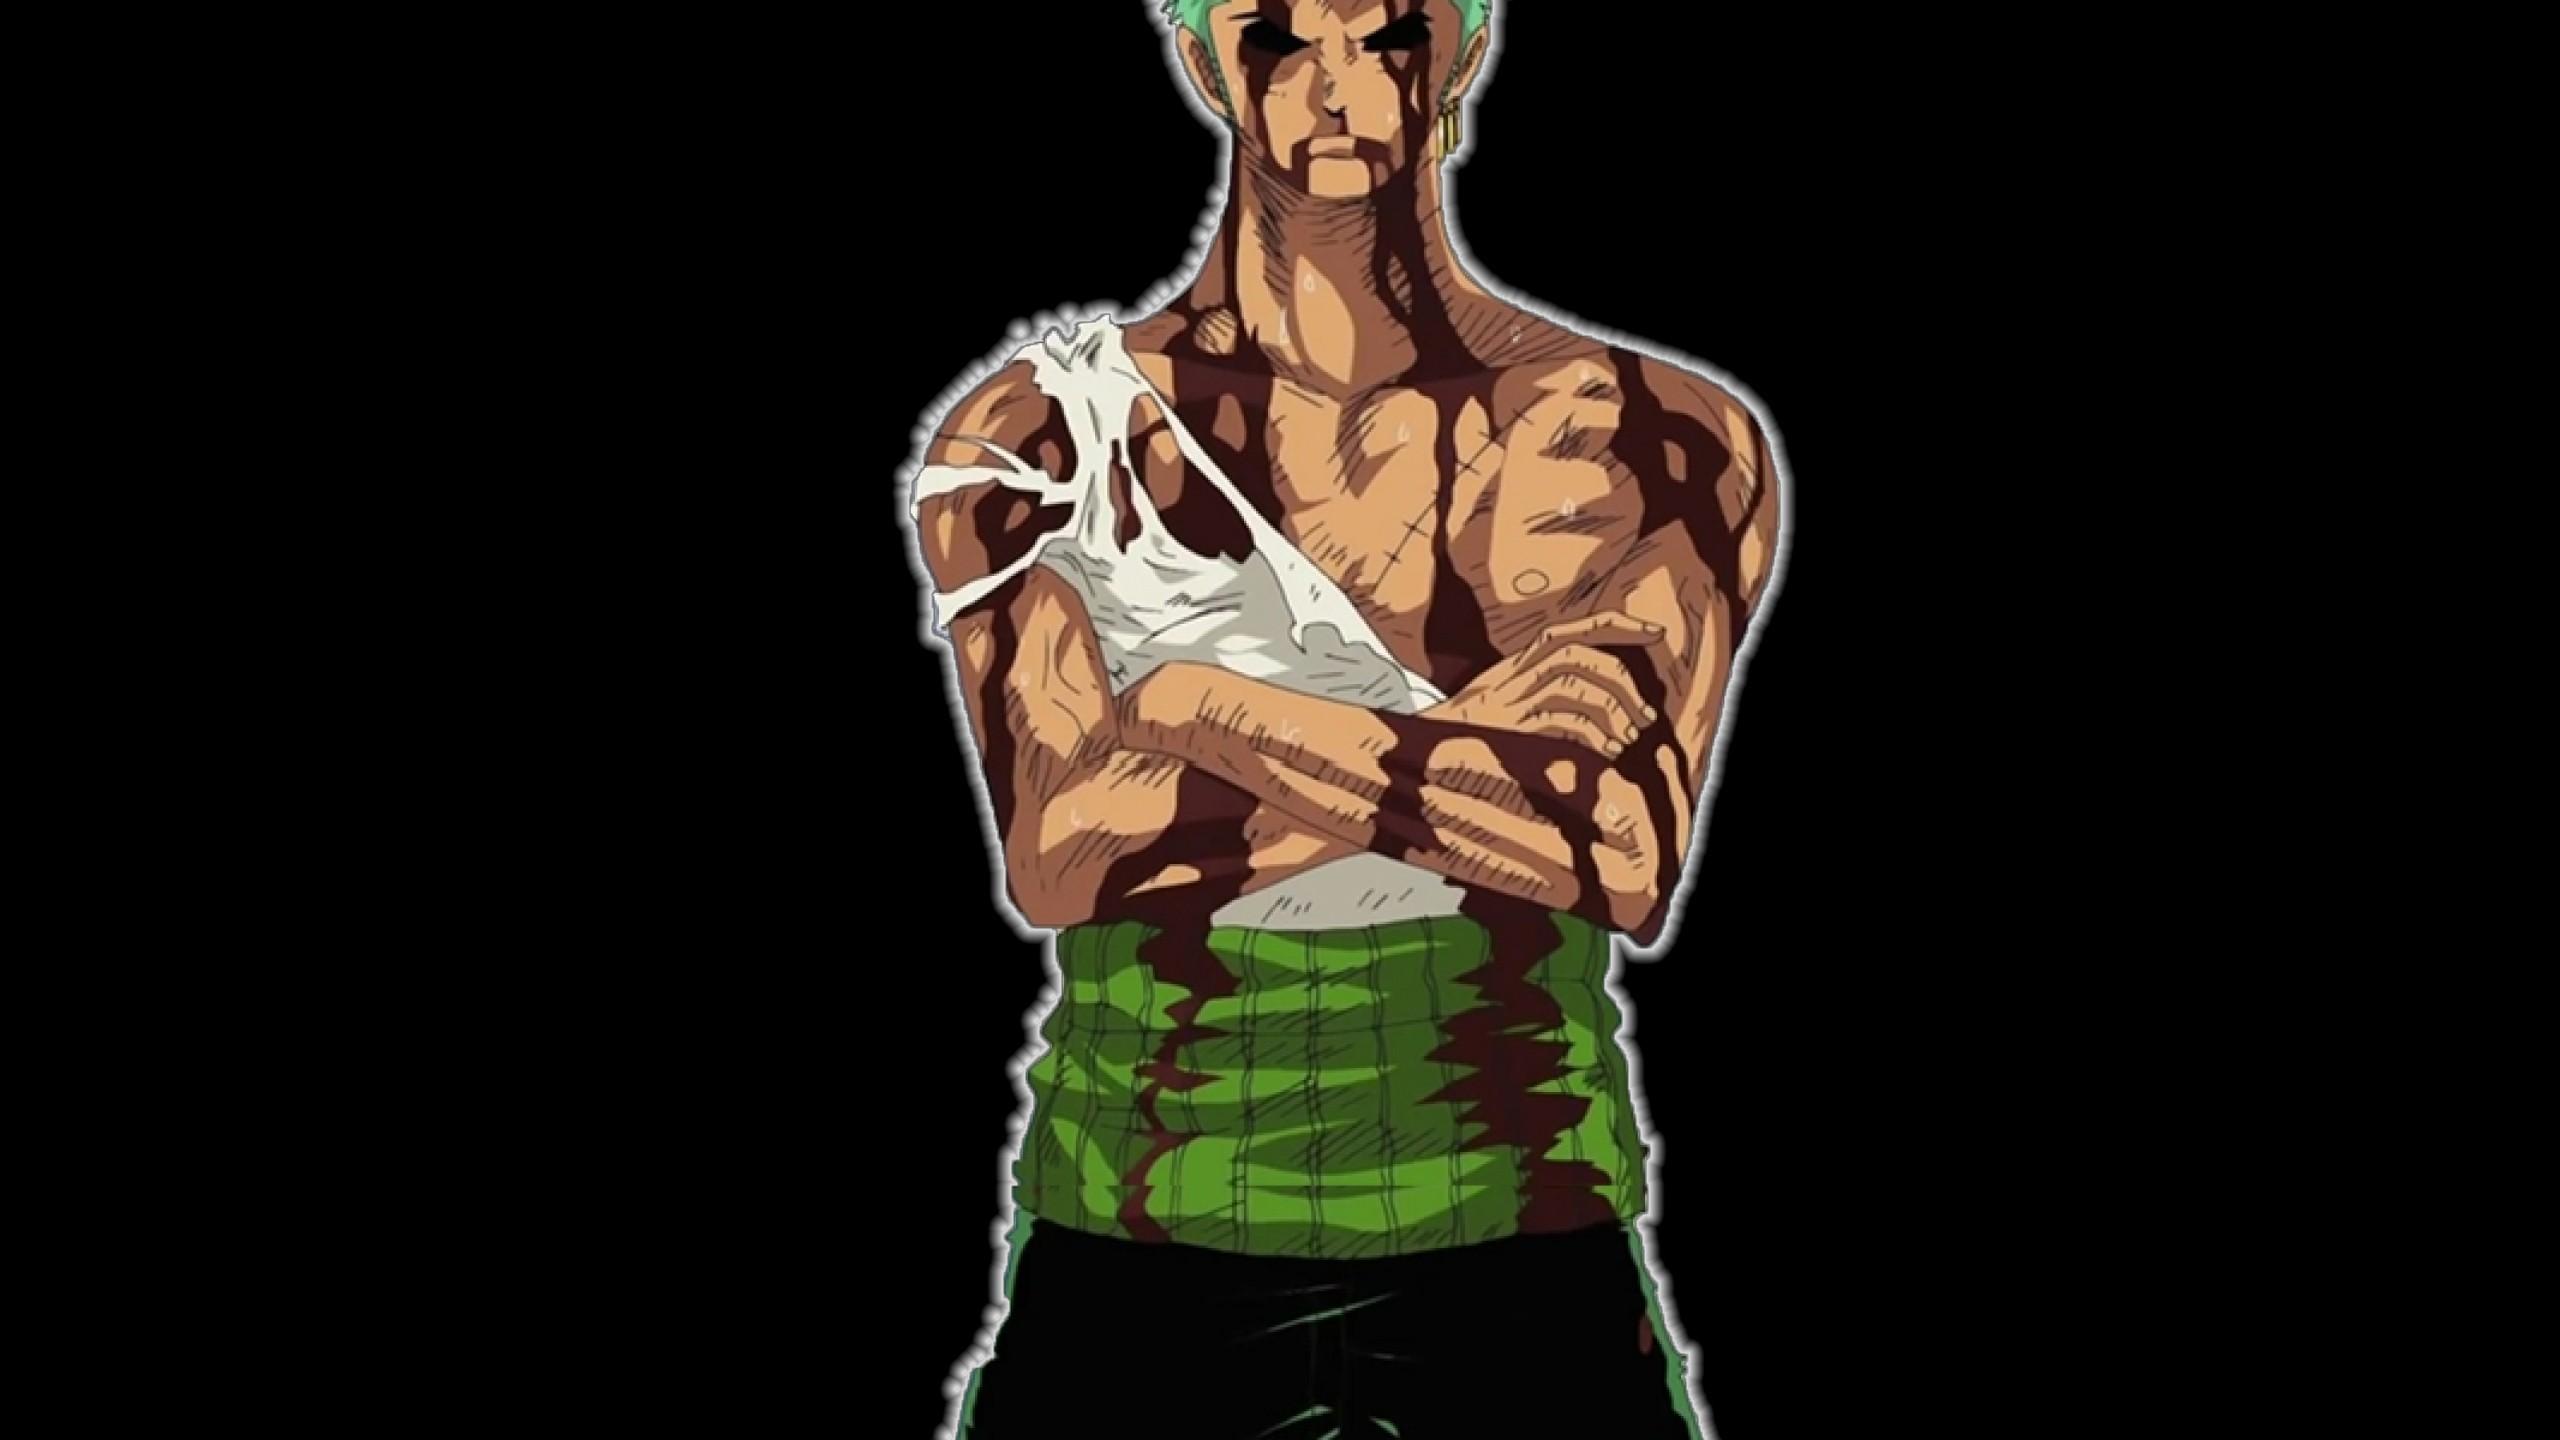 One Piece Zoro Zorro Roronoa Black Background Wallpaper 2560x1440 Download Hd Wallpaper Wallpapertip